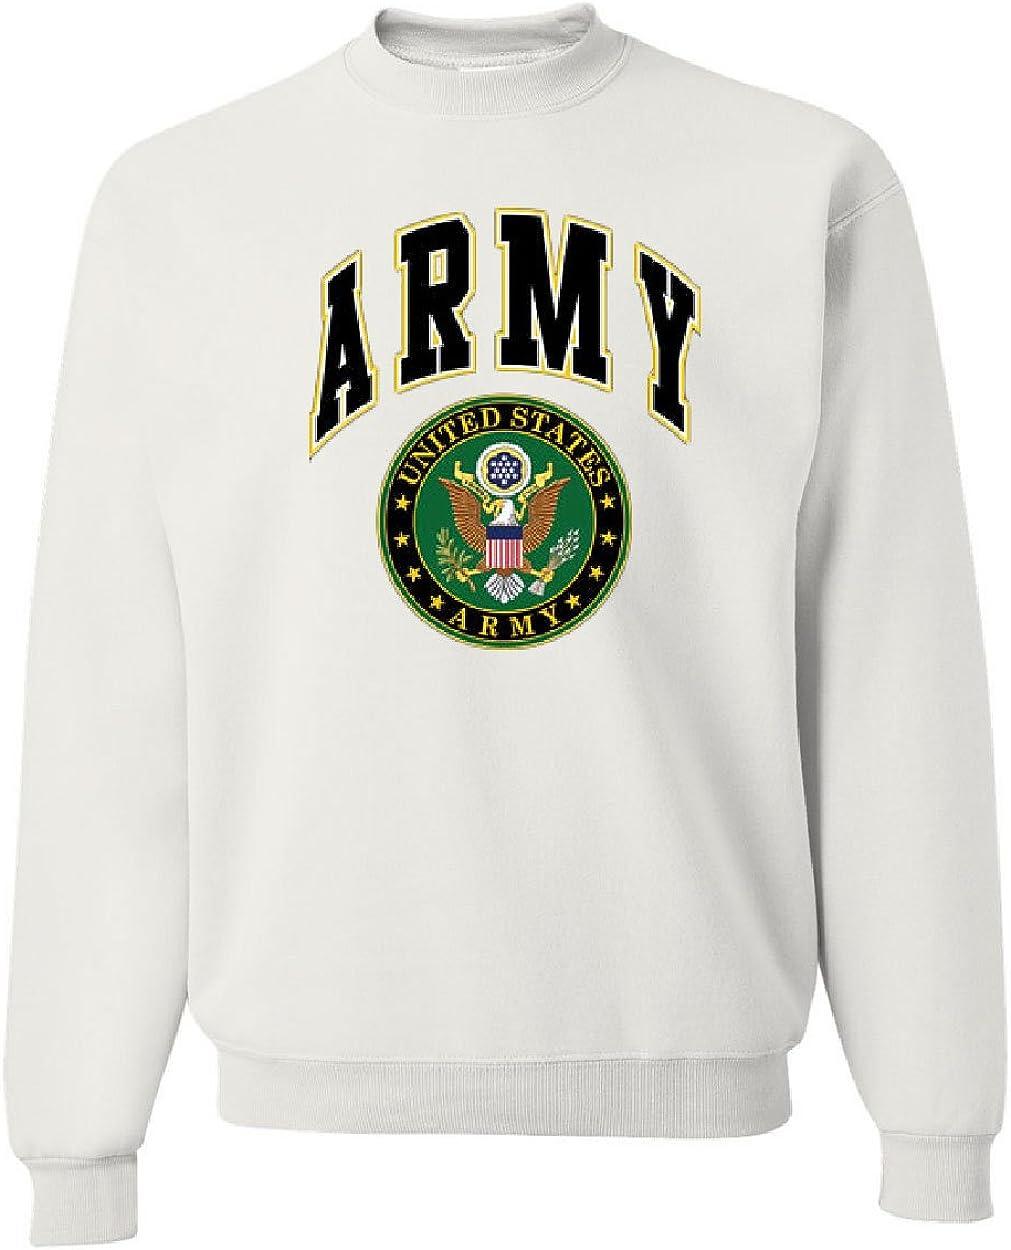 United States Army Crew Neck Sweatshirt Army Crest Patriotic